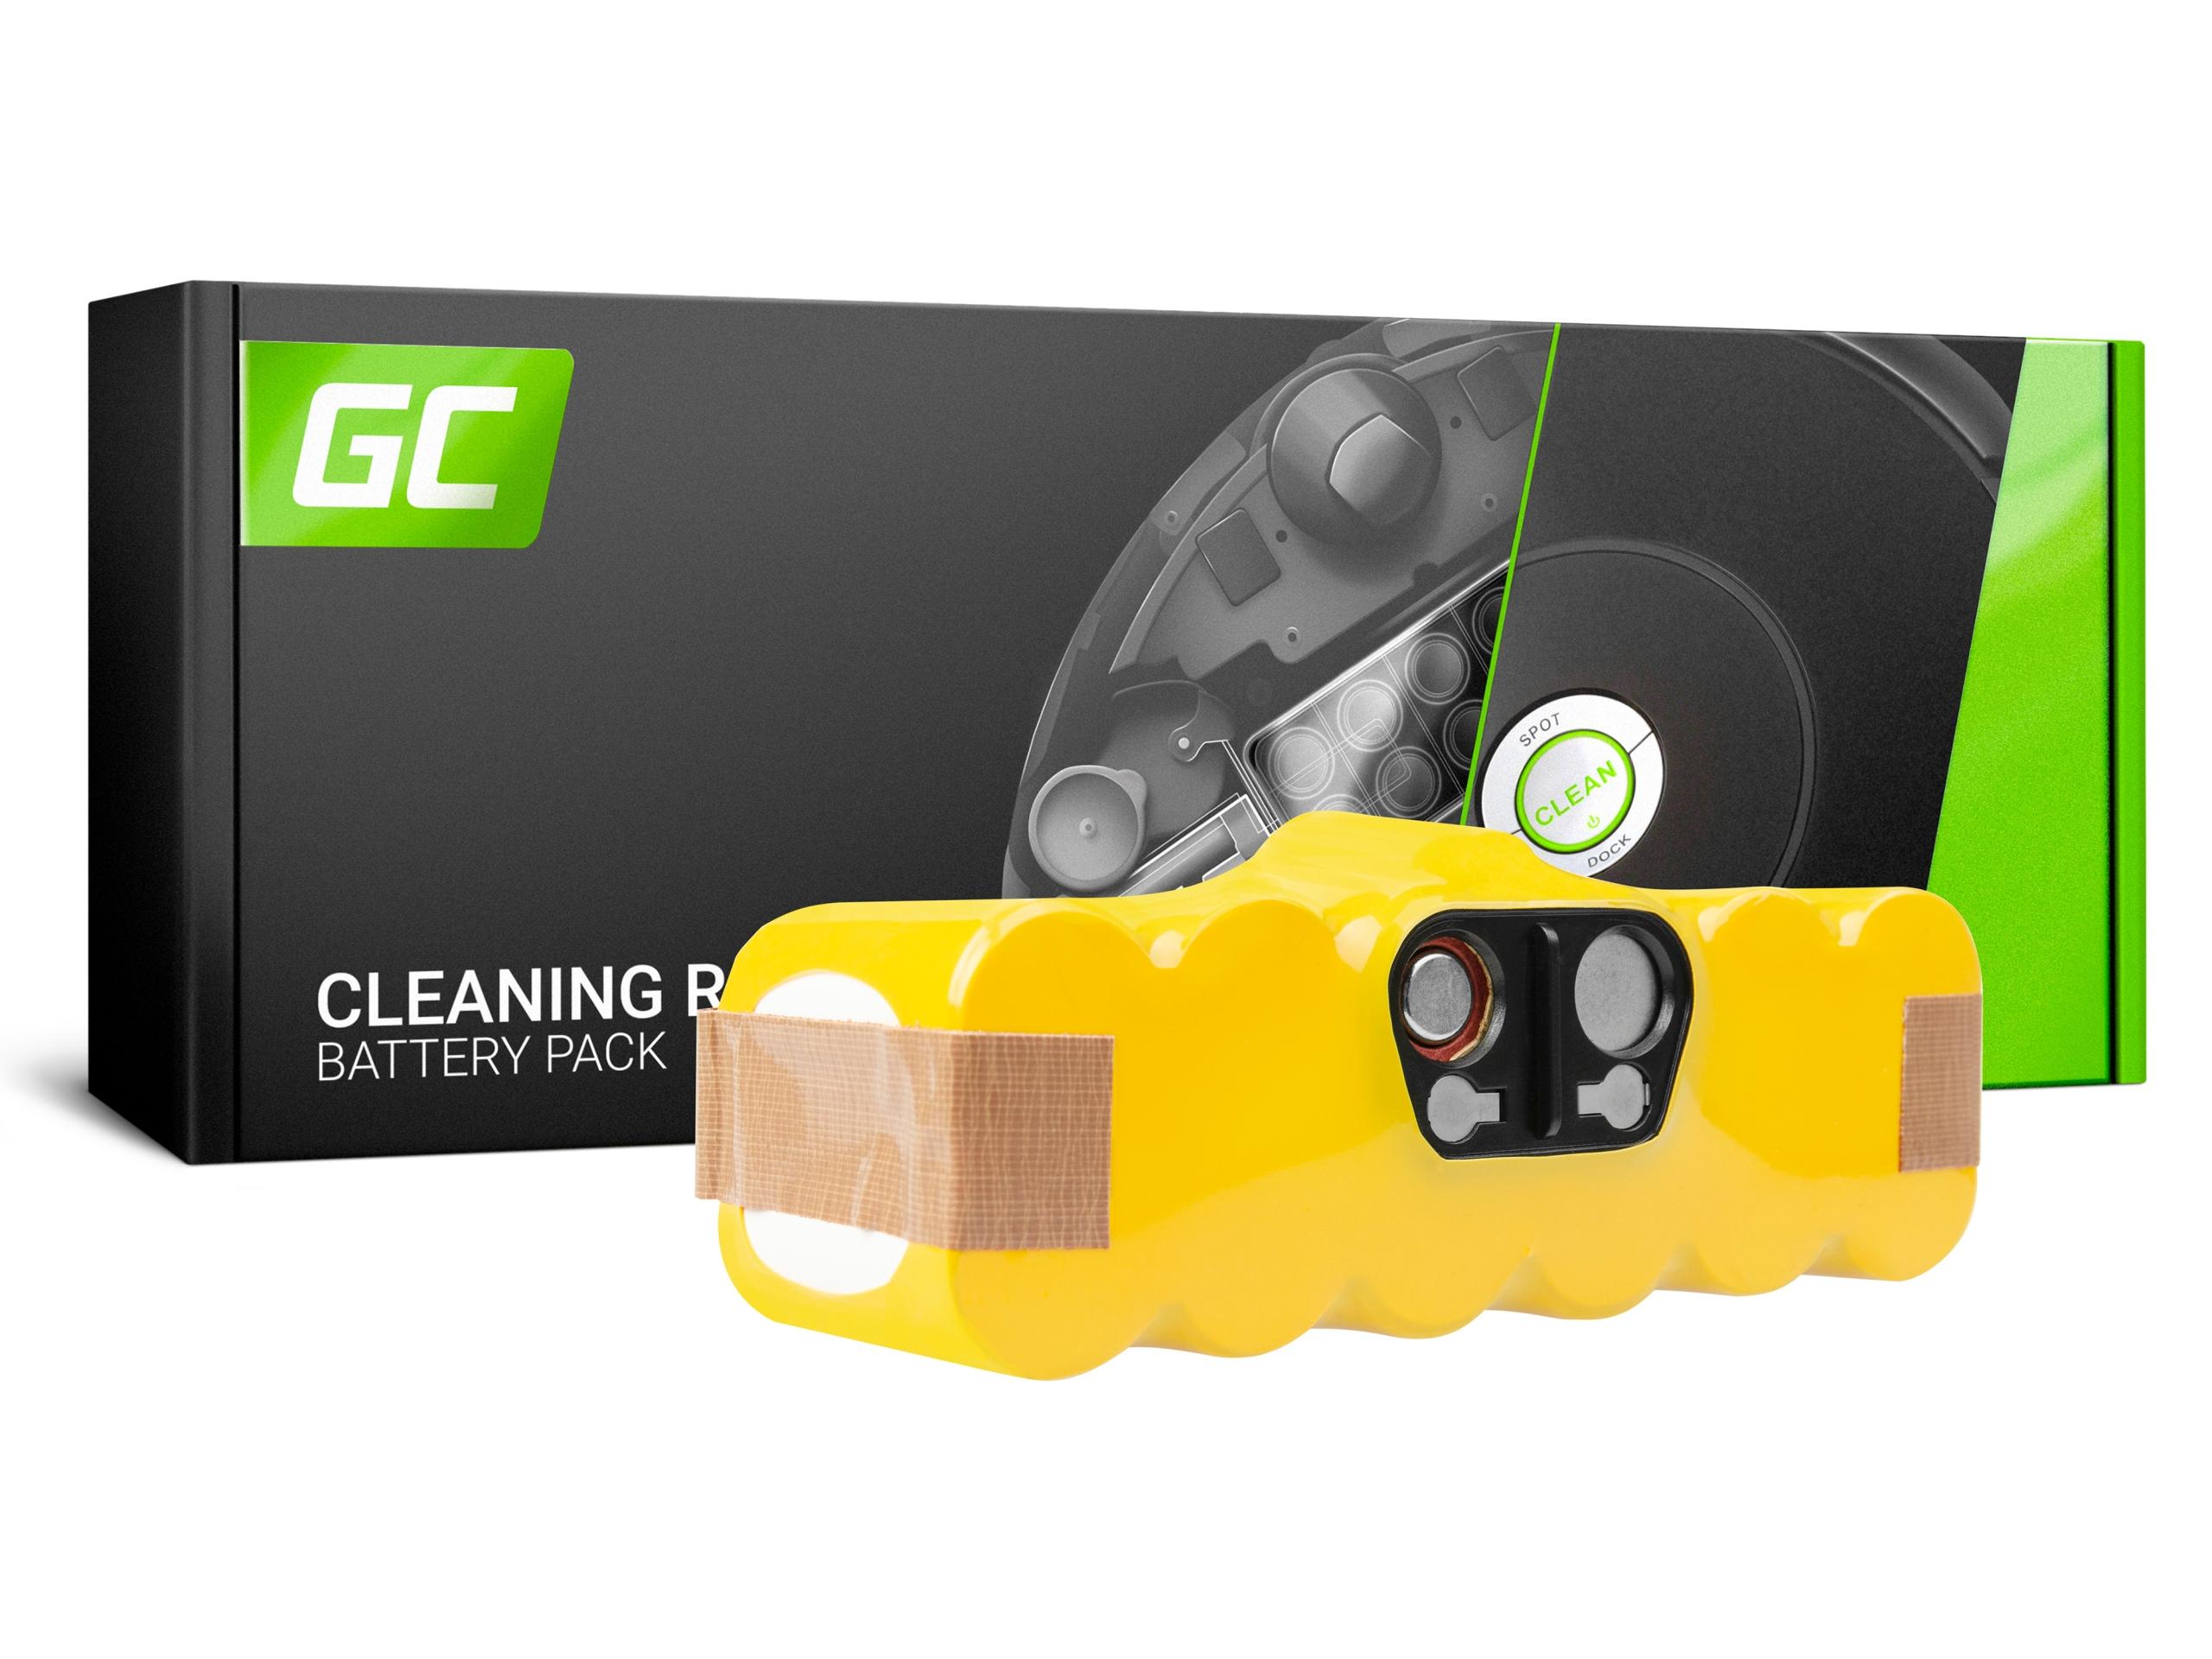 Bateria Akumulator do iRobot Roomba 500 600 700 5940110230 - Sklep internetowy AGD, RTV, telefony, laptopy - Allegro.pl